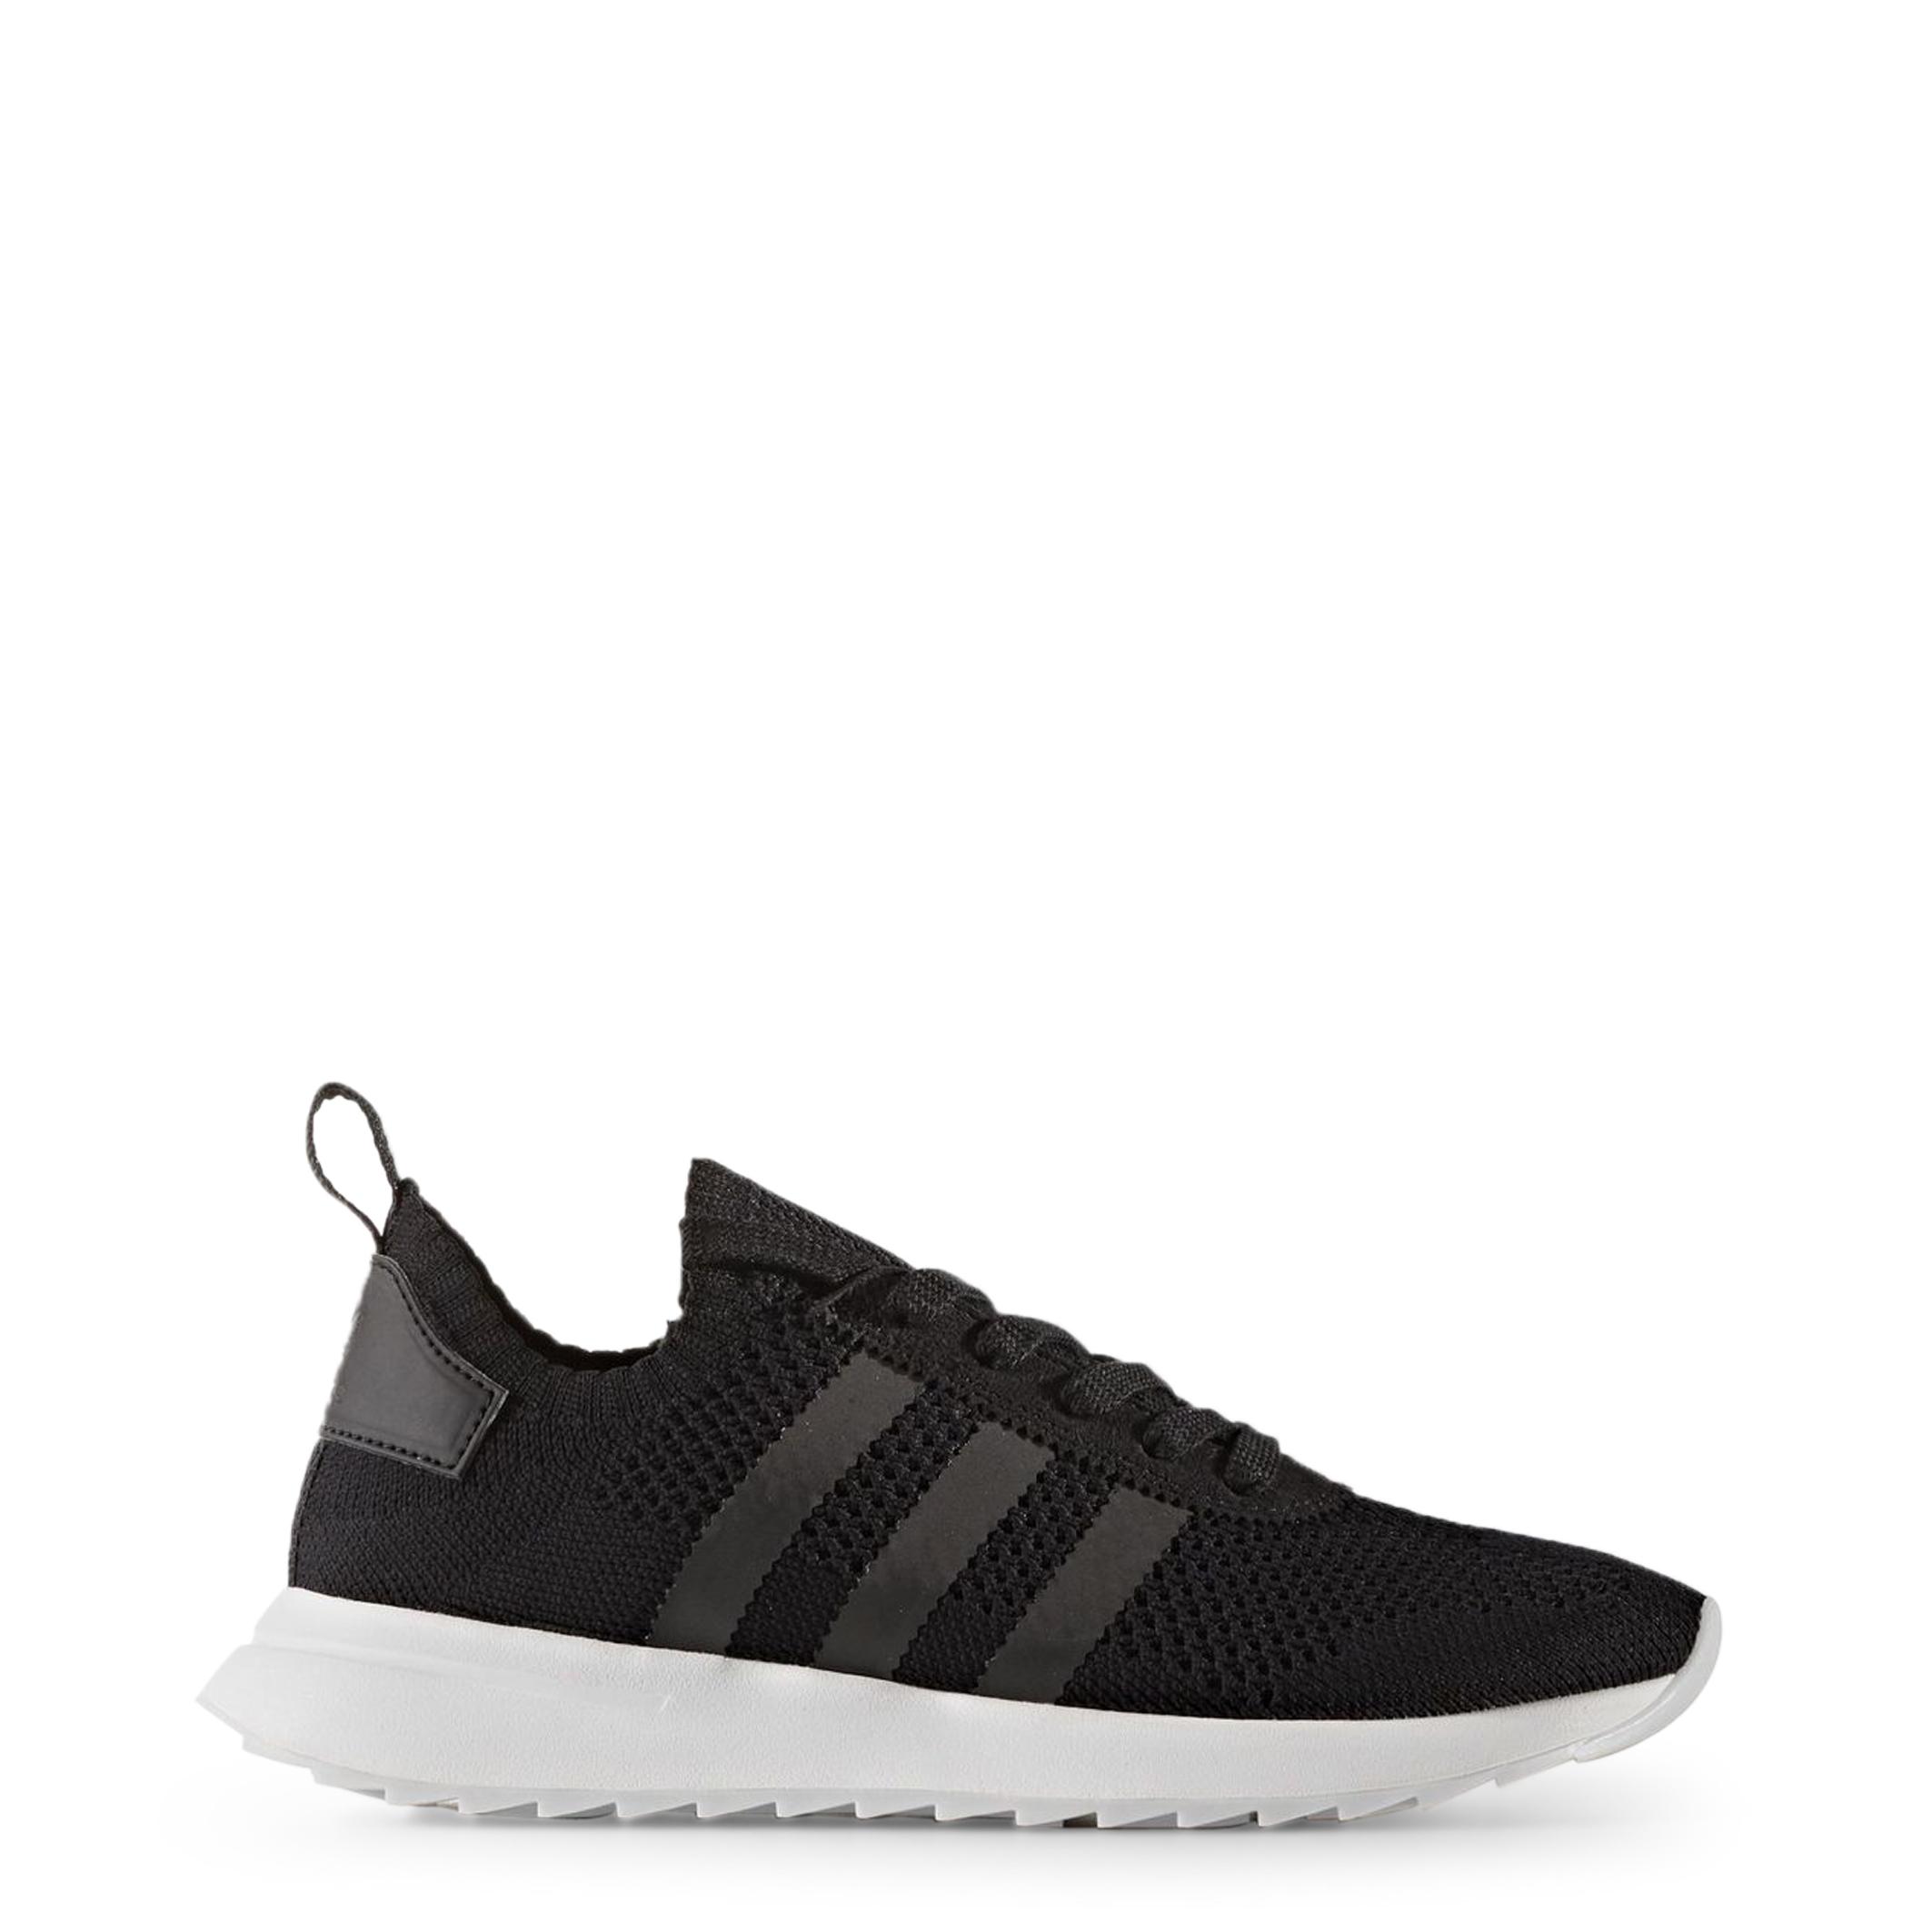 Adidas FLB_PRIMEKNIT